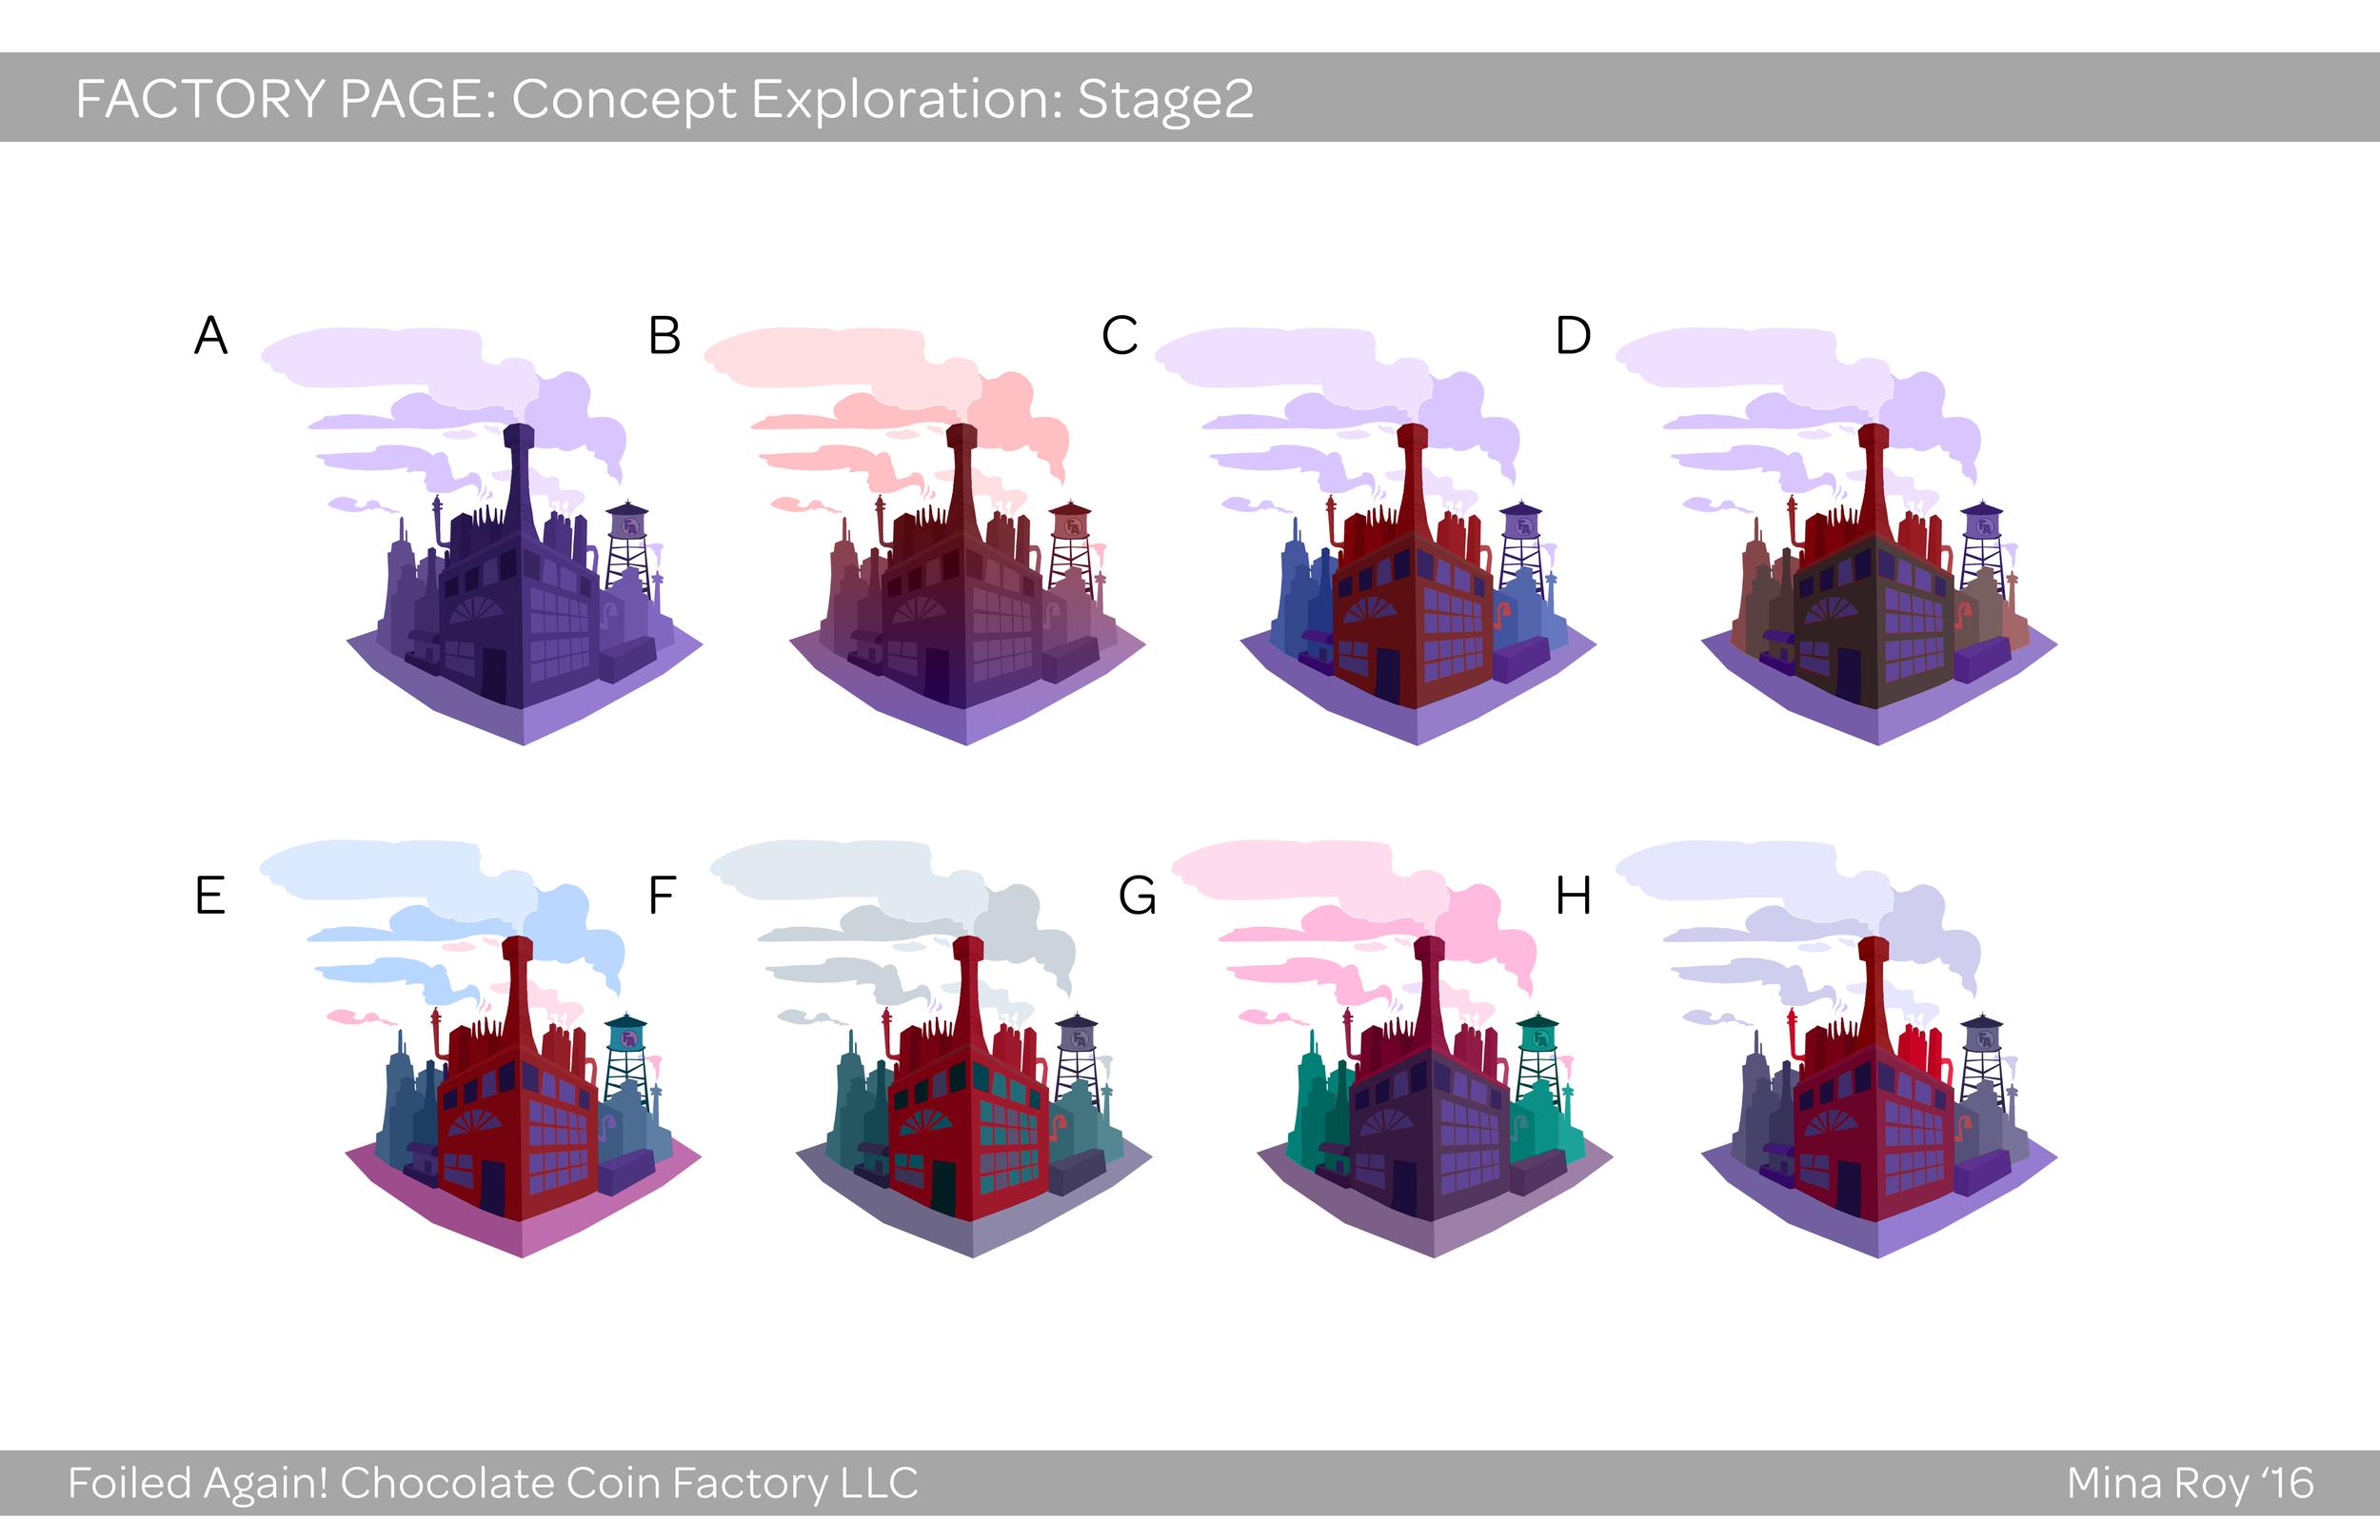 website-conceptdesign-factory-stage2.jpg